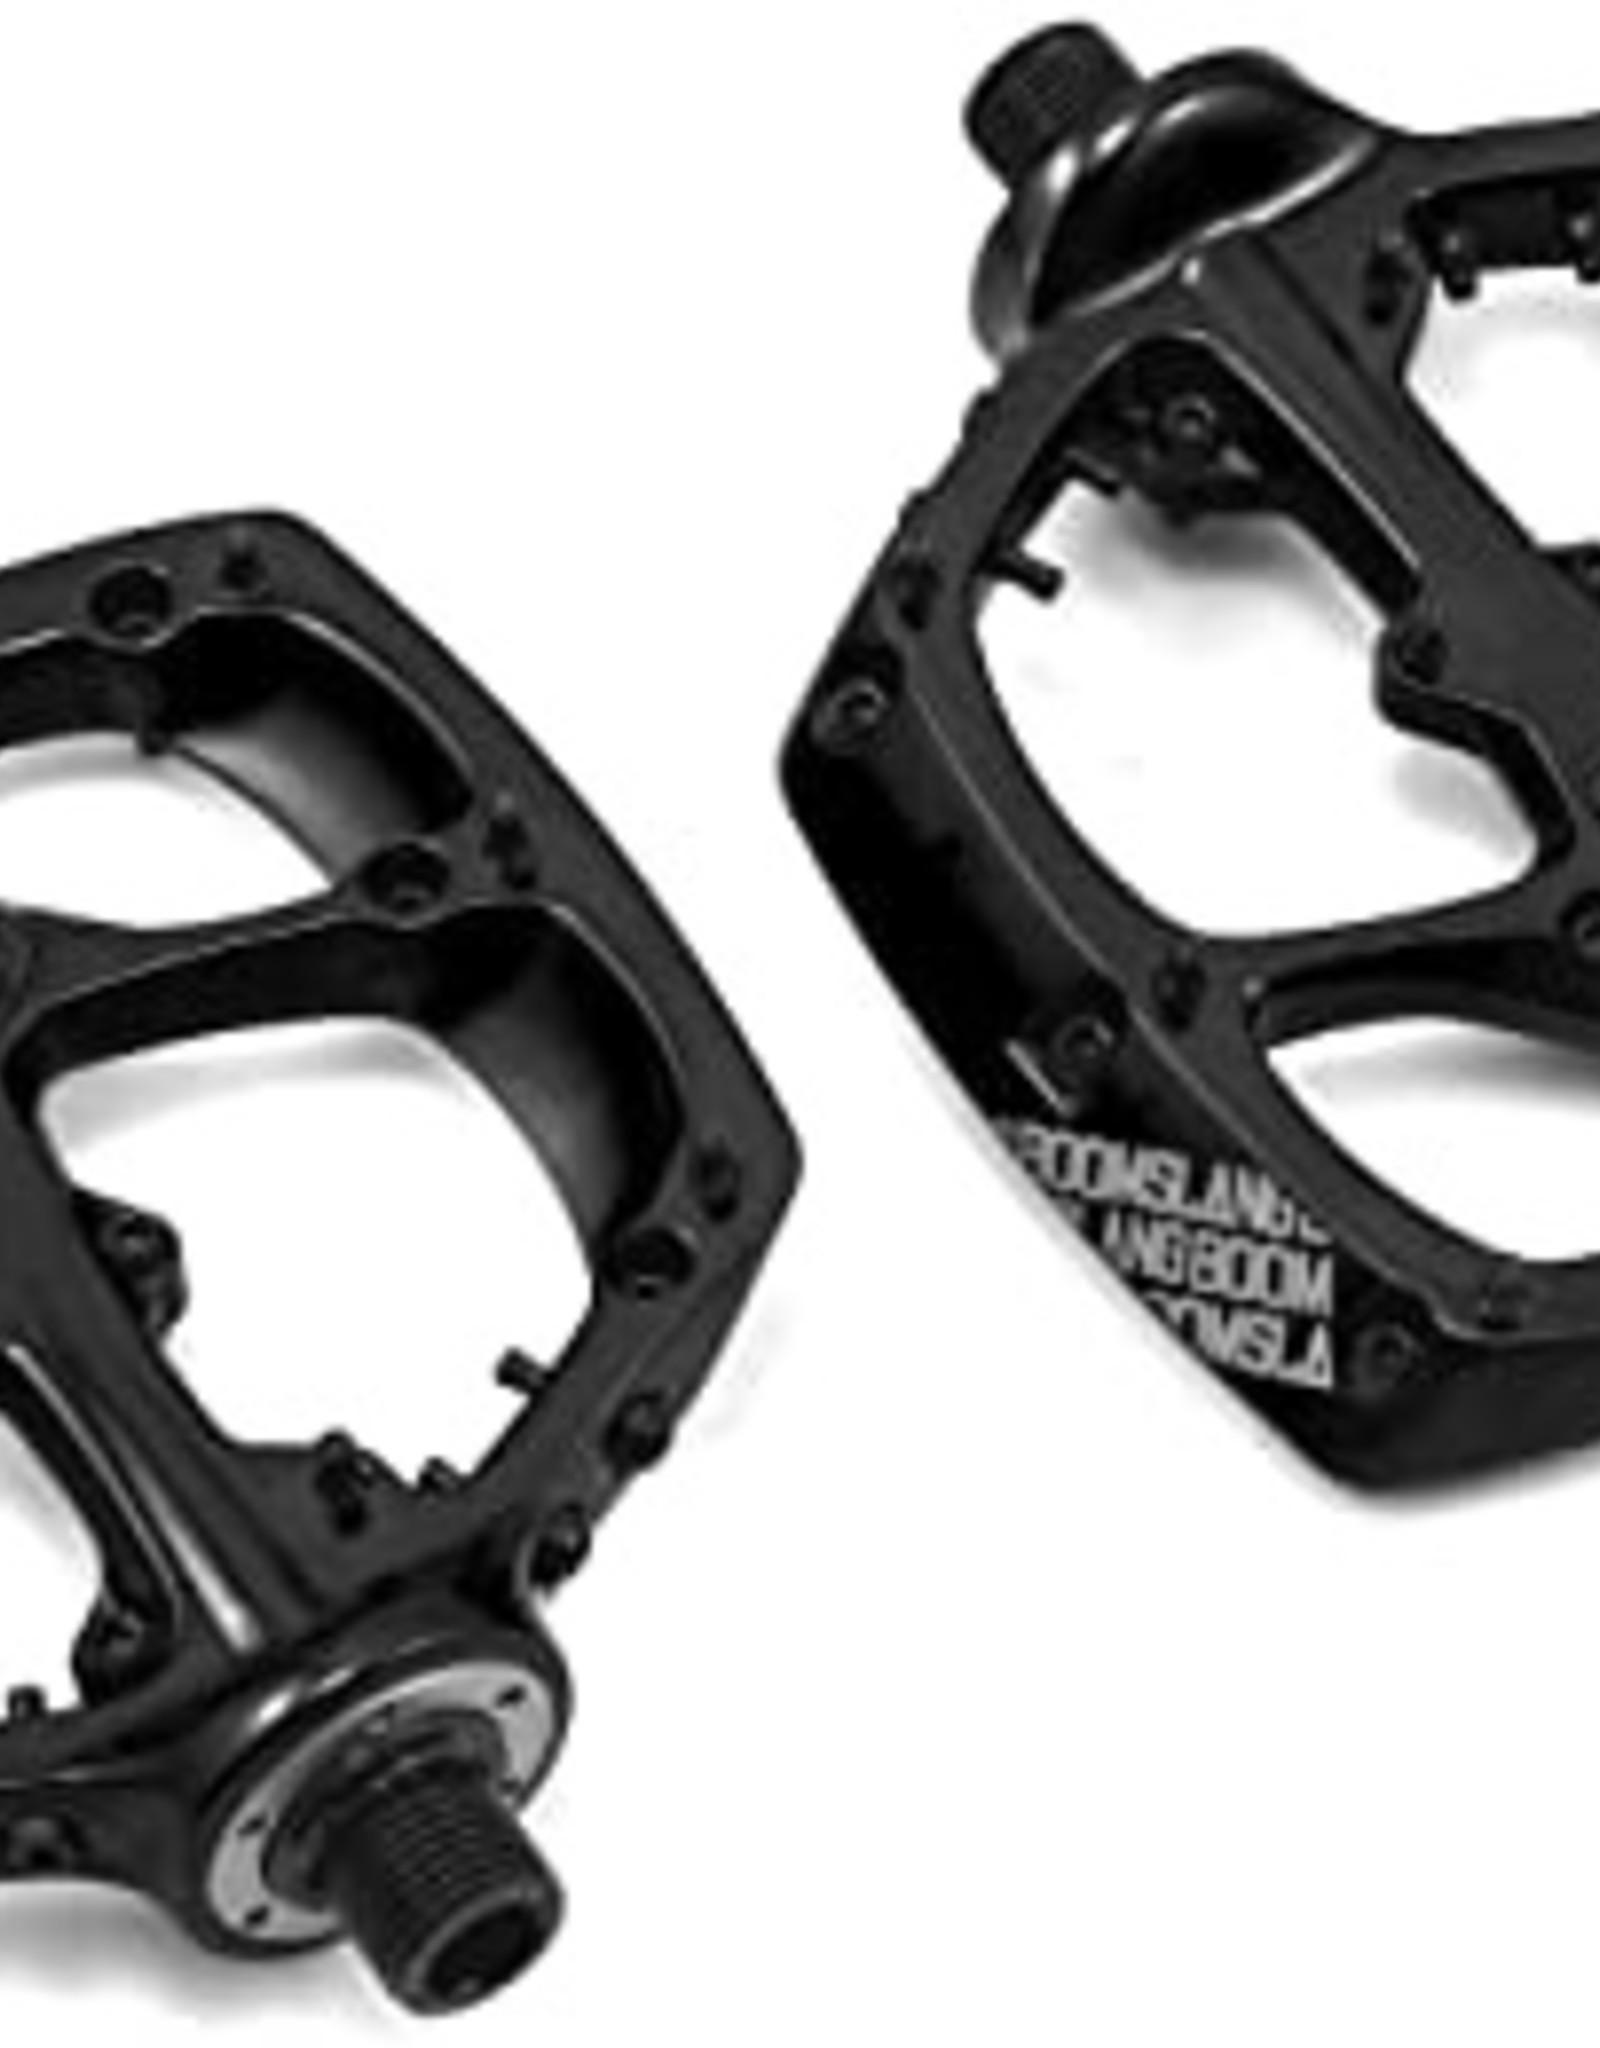 SPECIALIZED Specialized Boomslang Platform Pedals Black